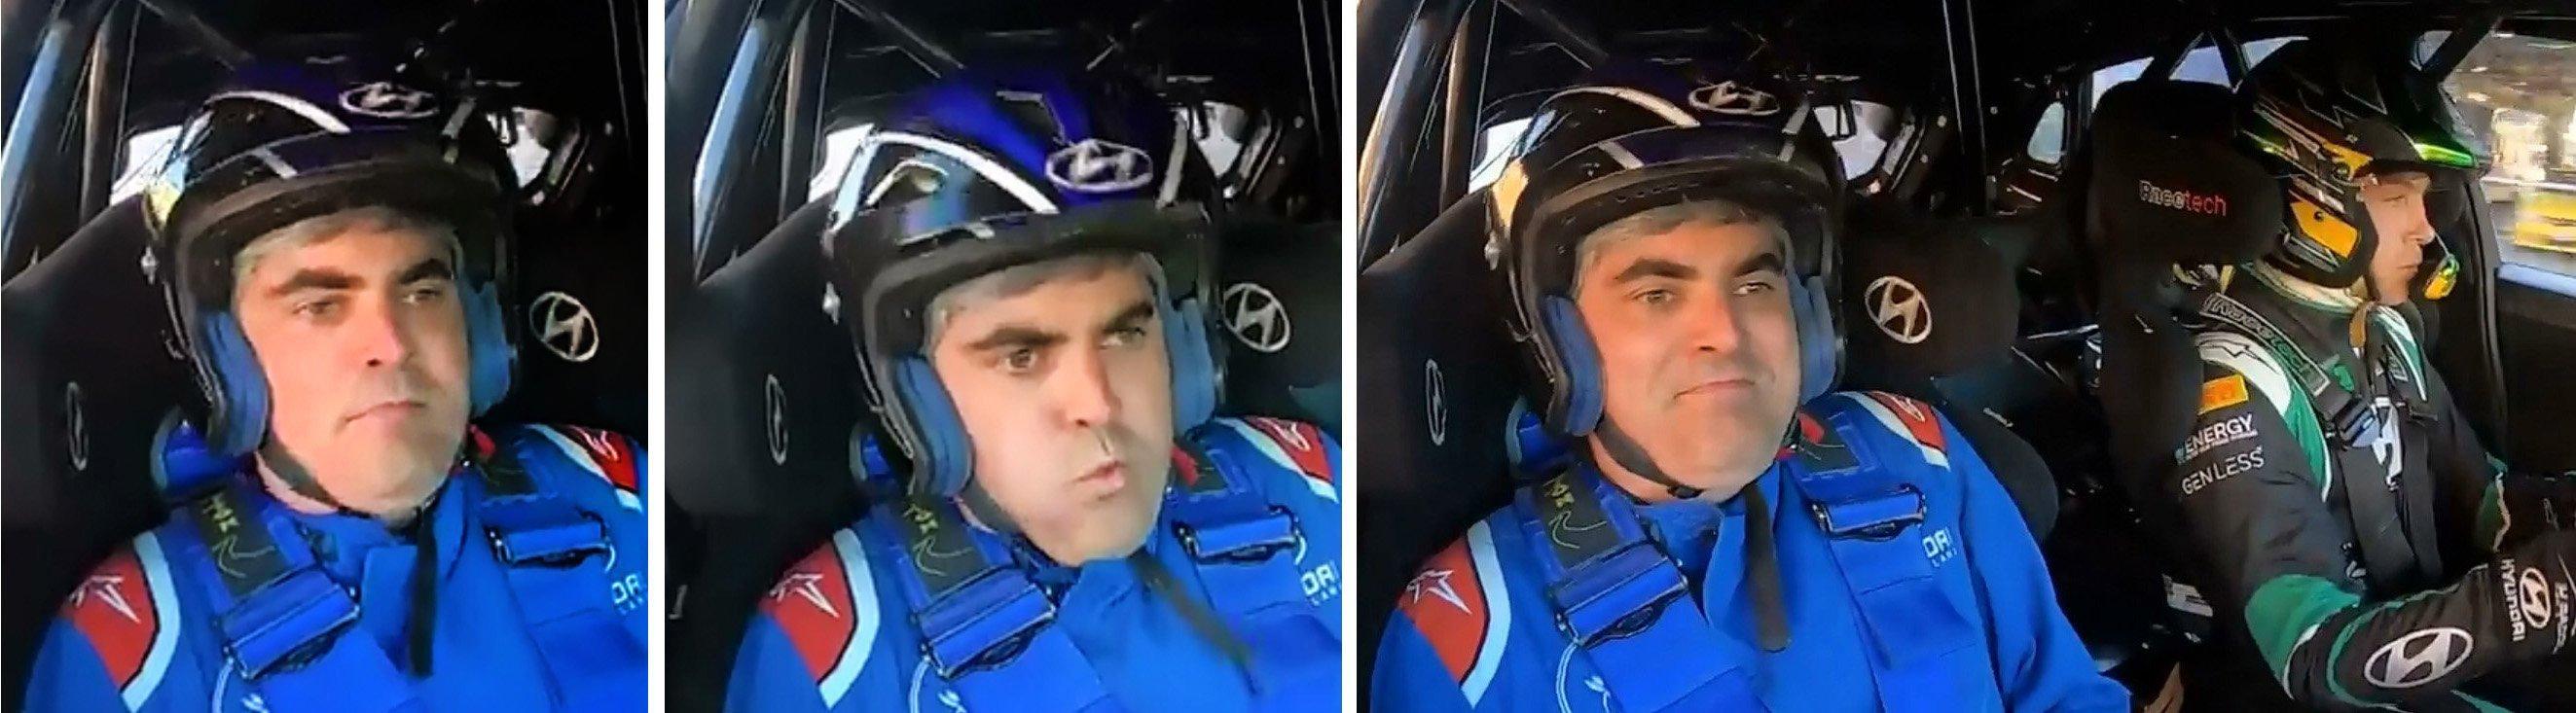 Dunedin Mayor Aaron Hawkins' face tells the story of his wild ride with 2021 Otago Rally champion...